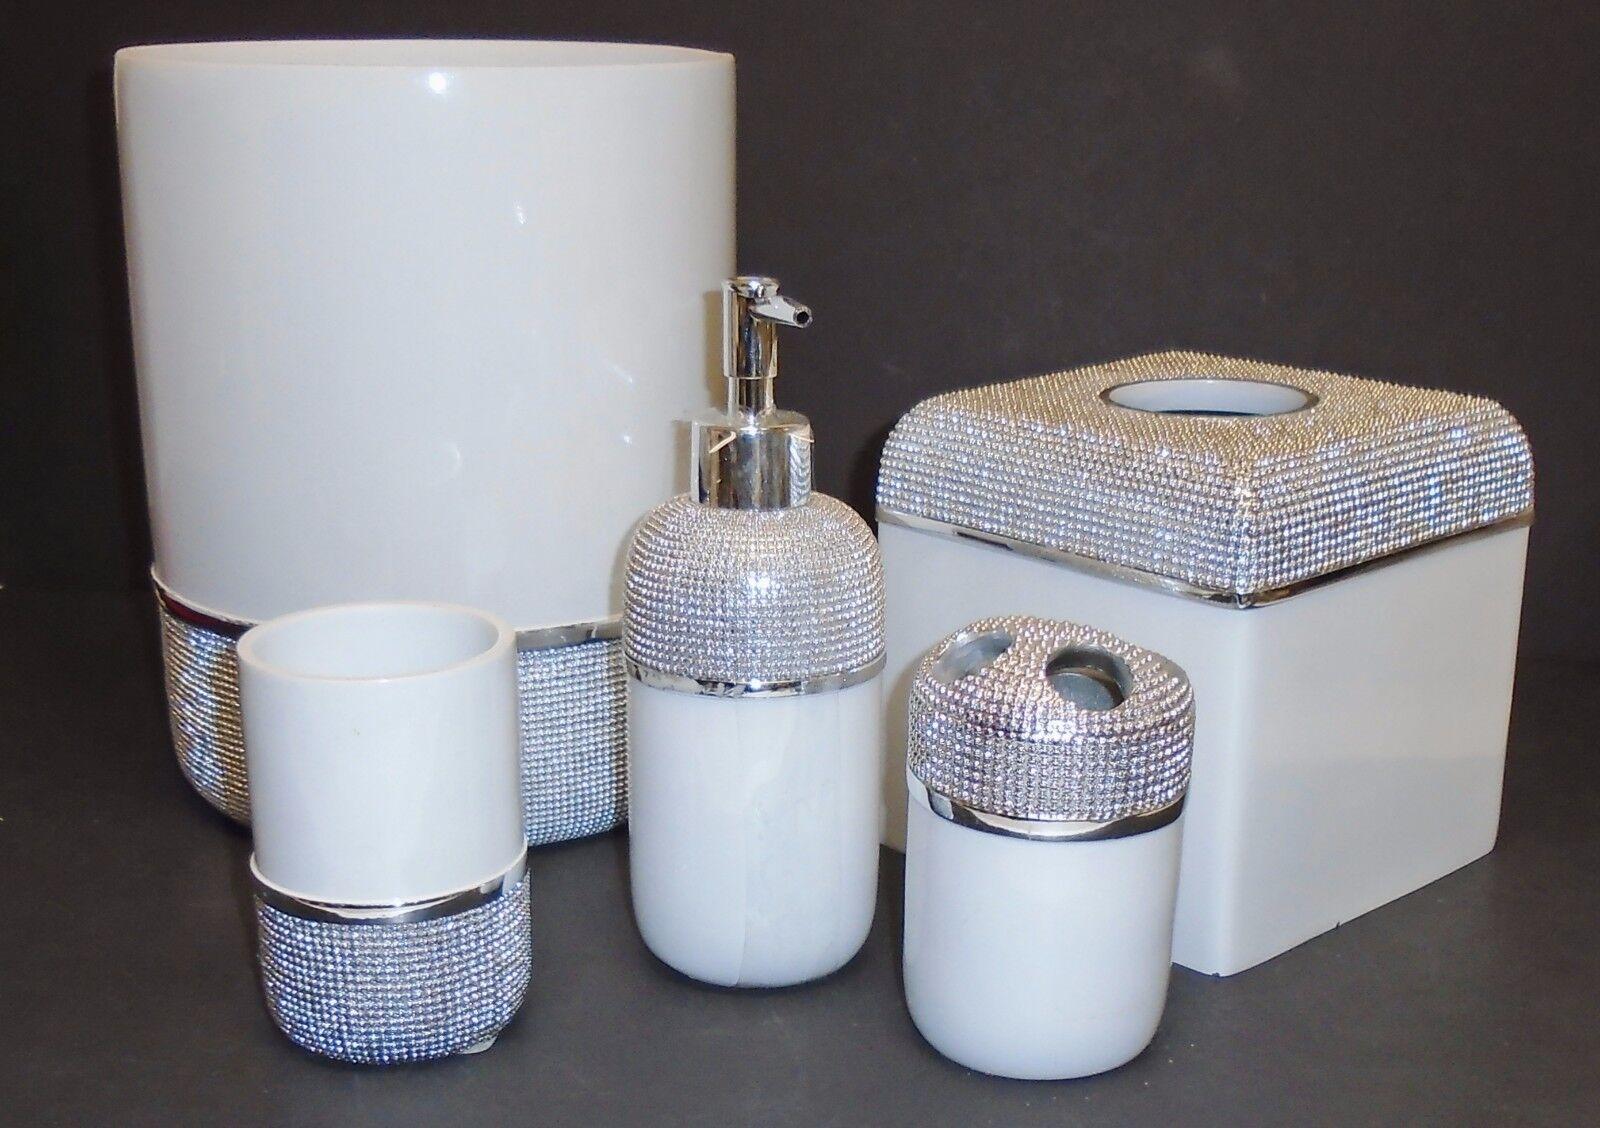 Neu 5 Teile Set Weiß + Metallisch Silber Harz Seifenspender+Becher+Gewebe+